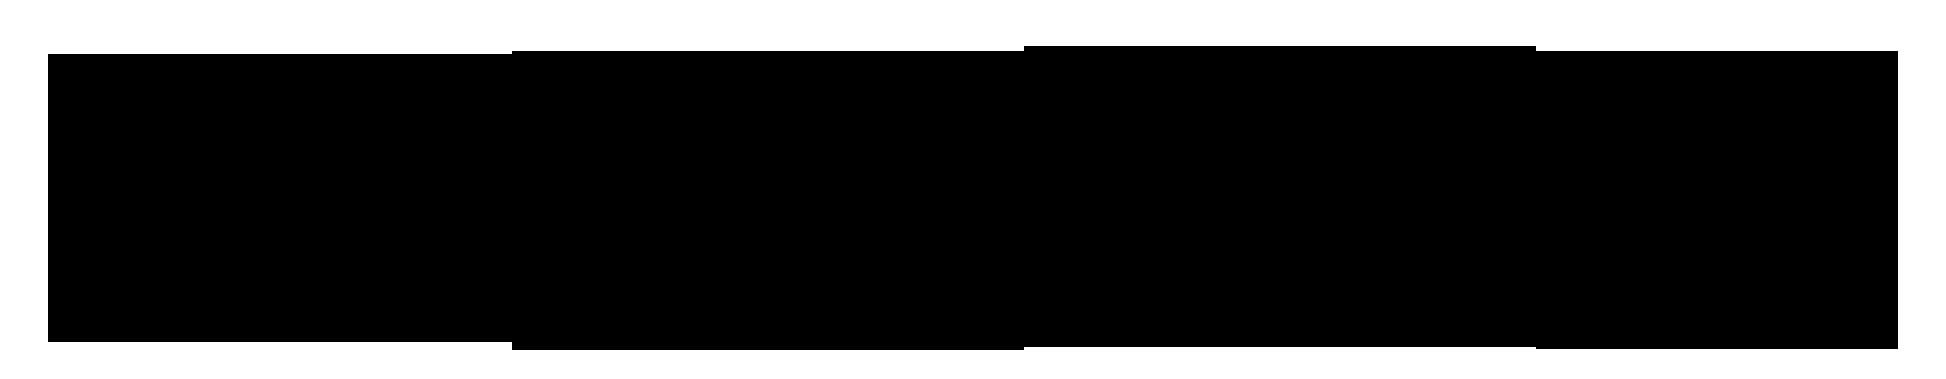 neurosis-logo-lg.png